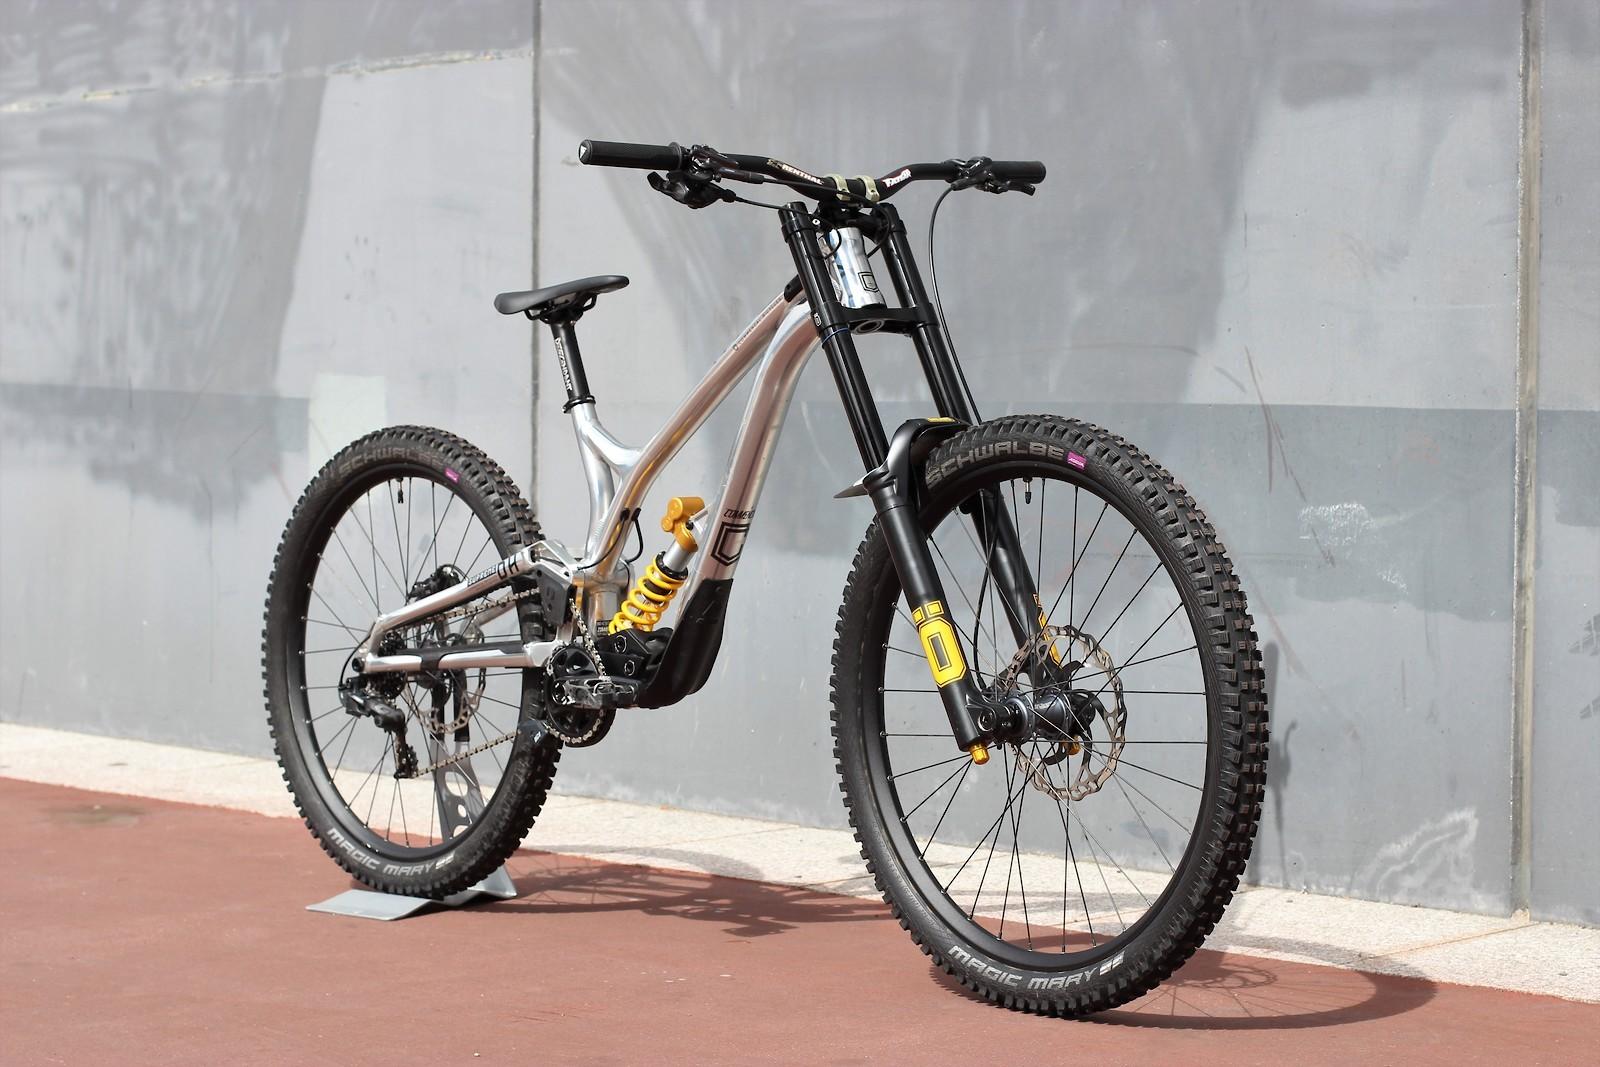 Commencal Supreme 29/27 - Vital Bike of the Day September 2020 - Mountain Biking Pictures - Vital MTB